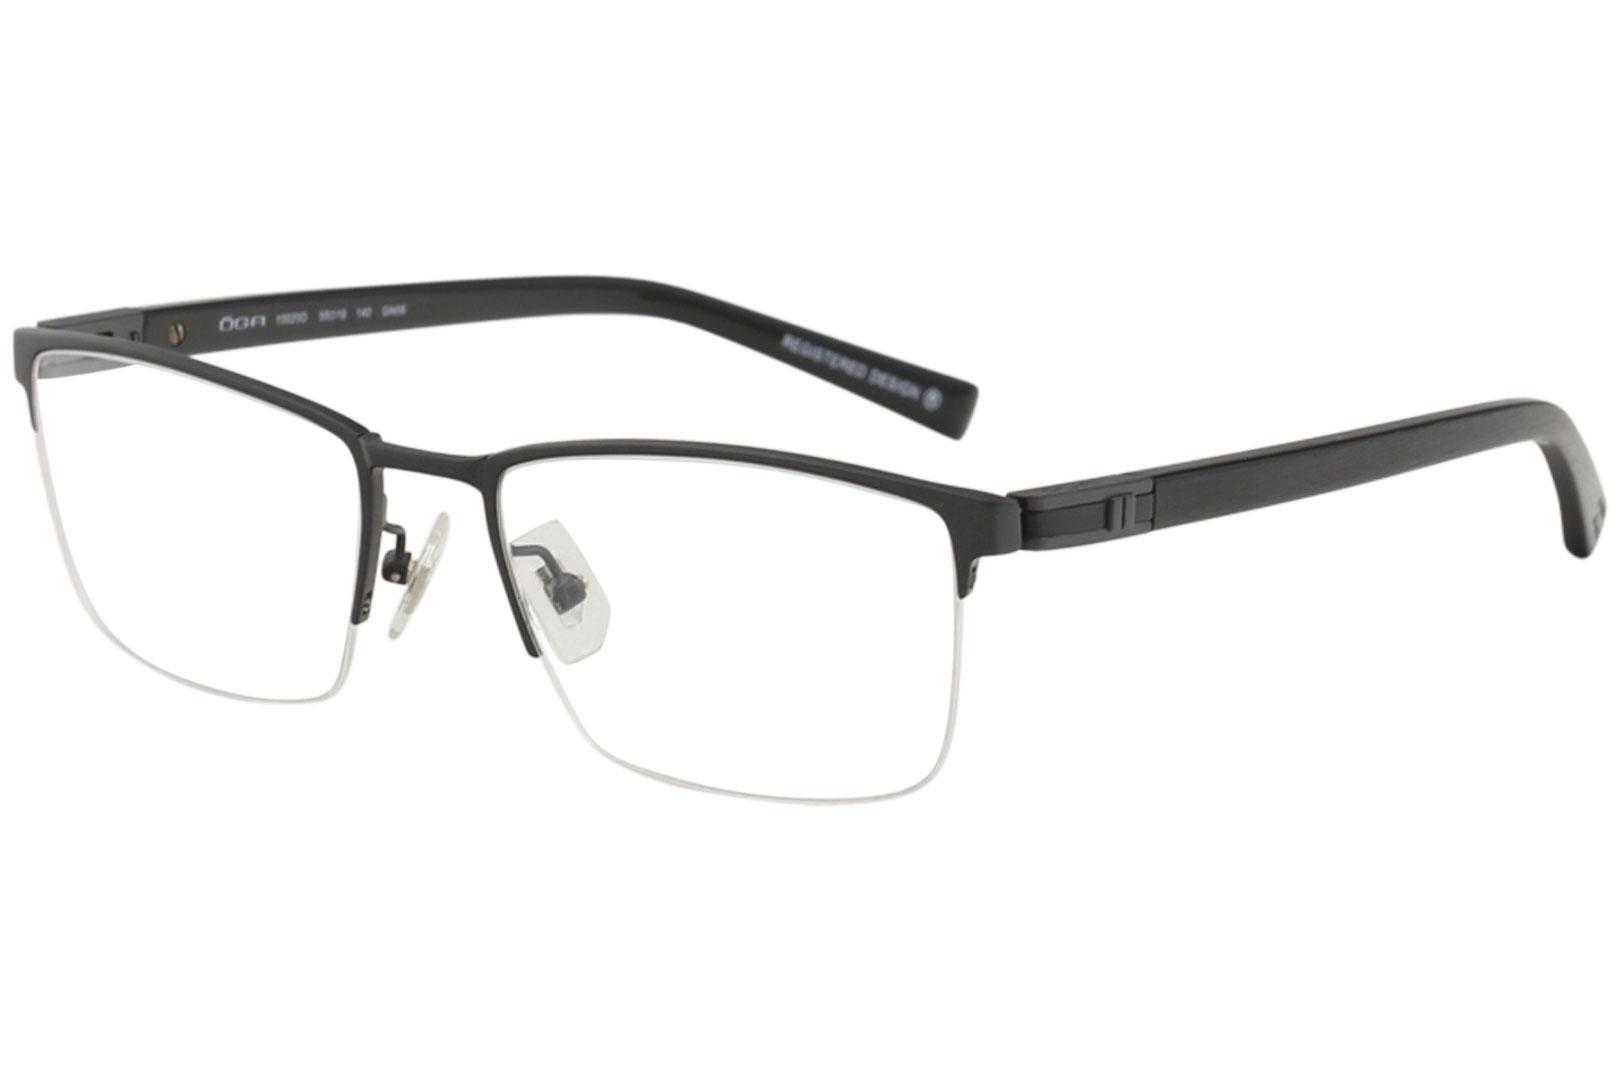 bc8dd8e8c4 Morel Men's Eyeglasses OGA 10020O 10020/O Half Rim Optical Frame